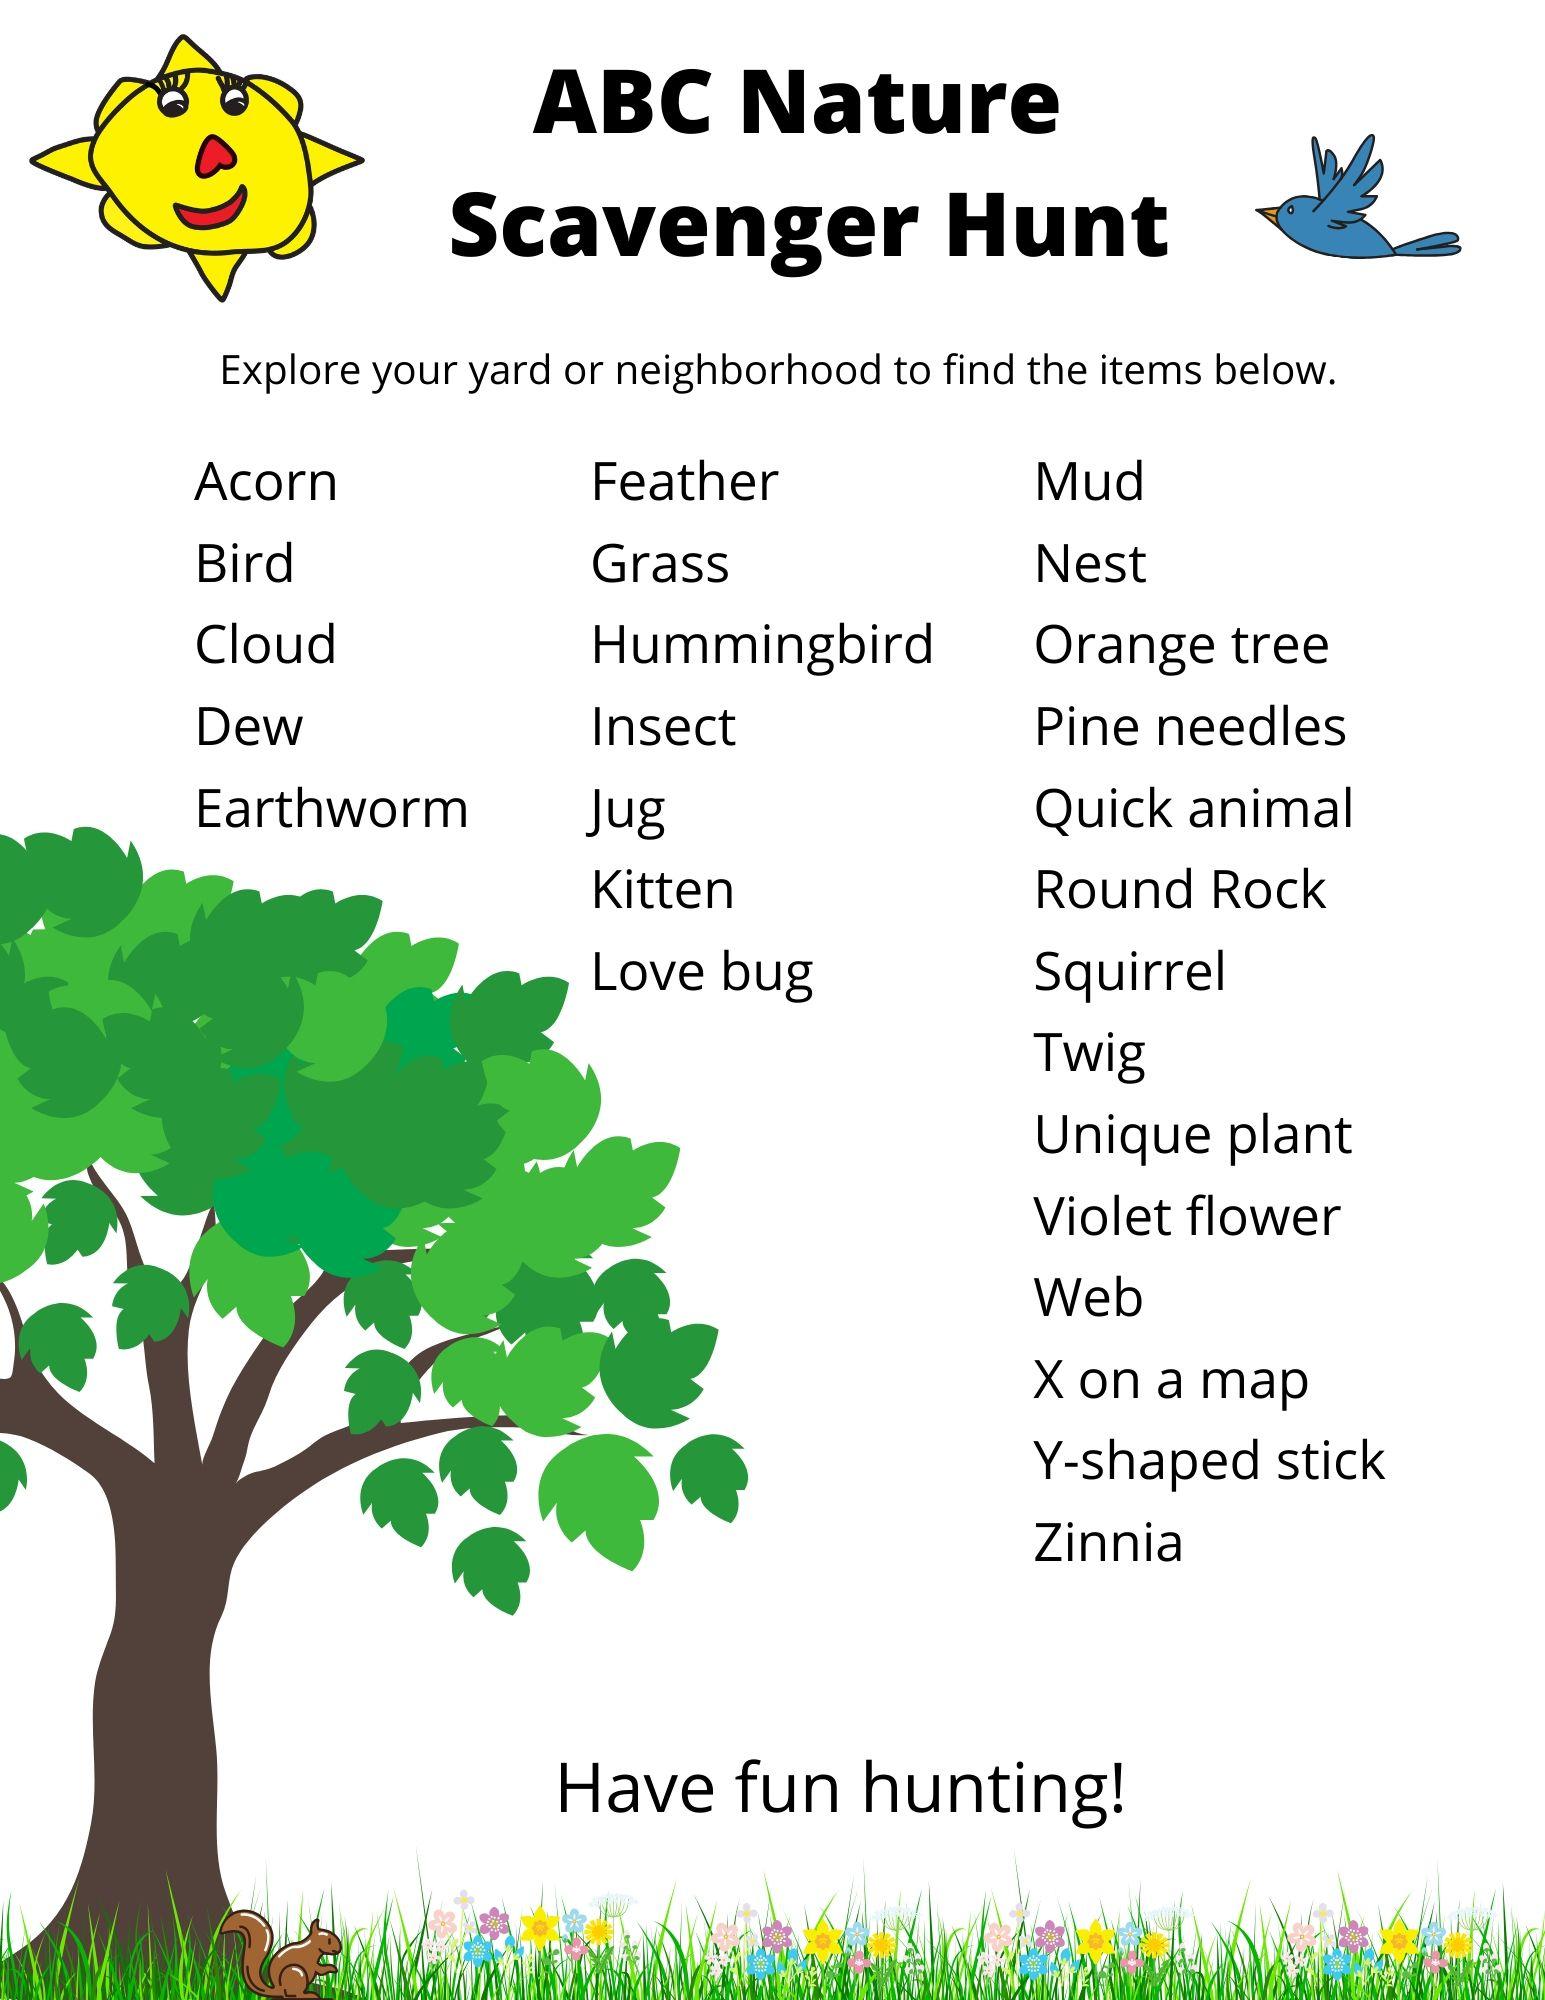 ABC Nature Scavenger Hunt (1)